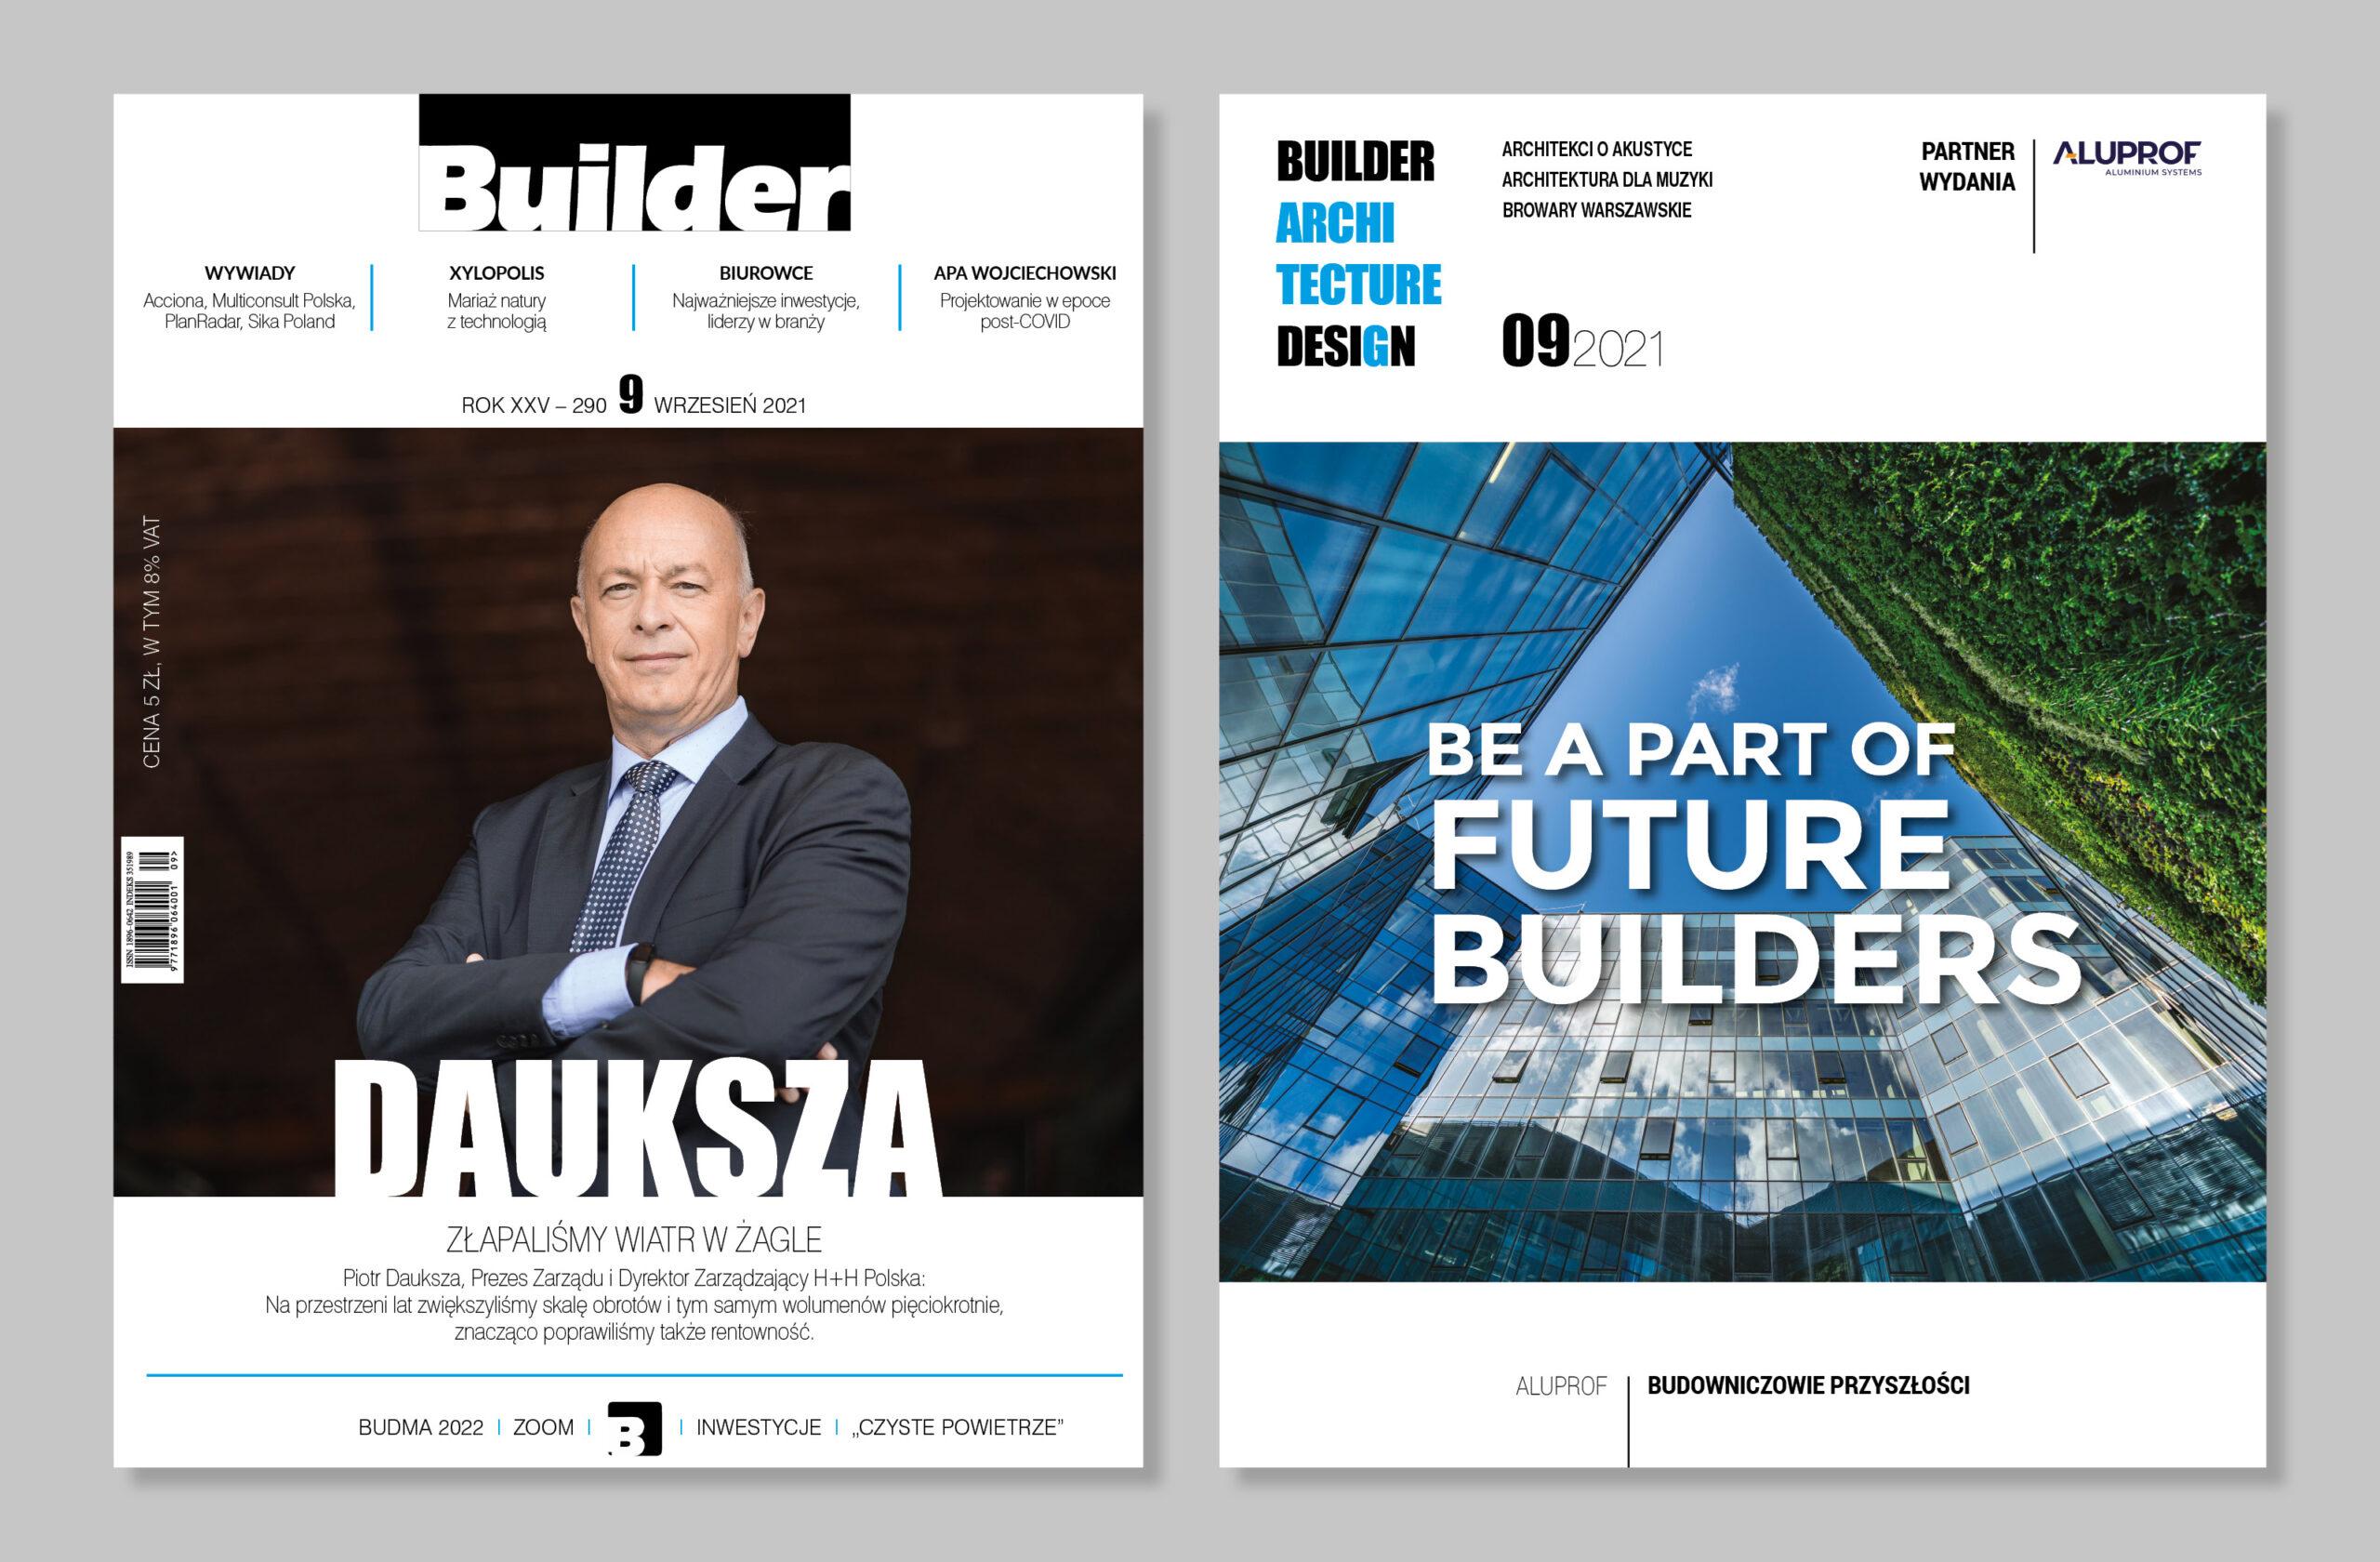 BUILDER 09.2021